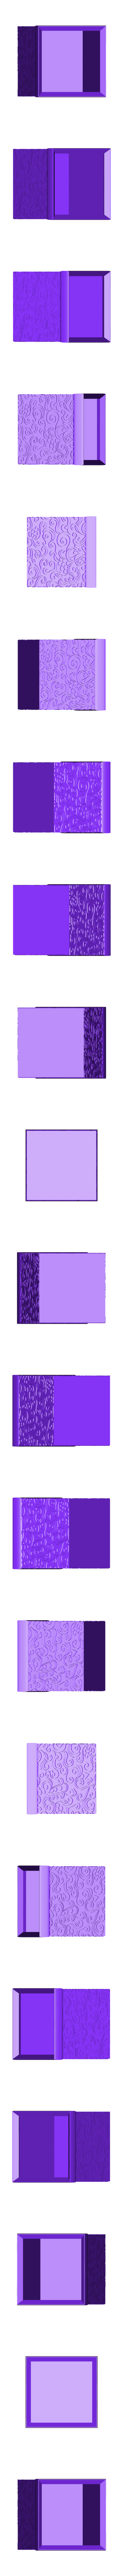 GiftBox_medium_filigree_bottom.STL Download free STL file Gift Box - Medium • 3D printer model, DDDeco